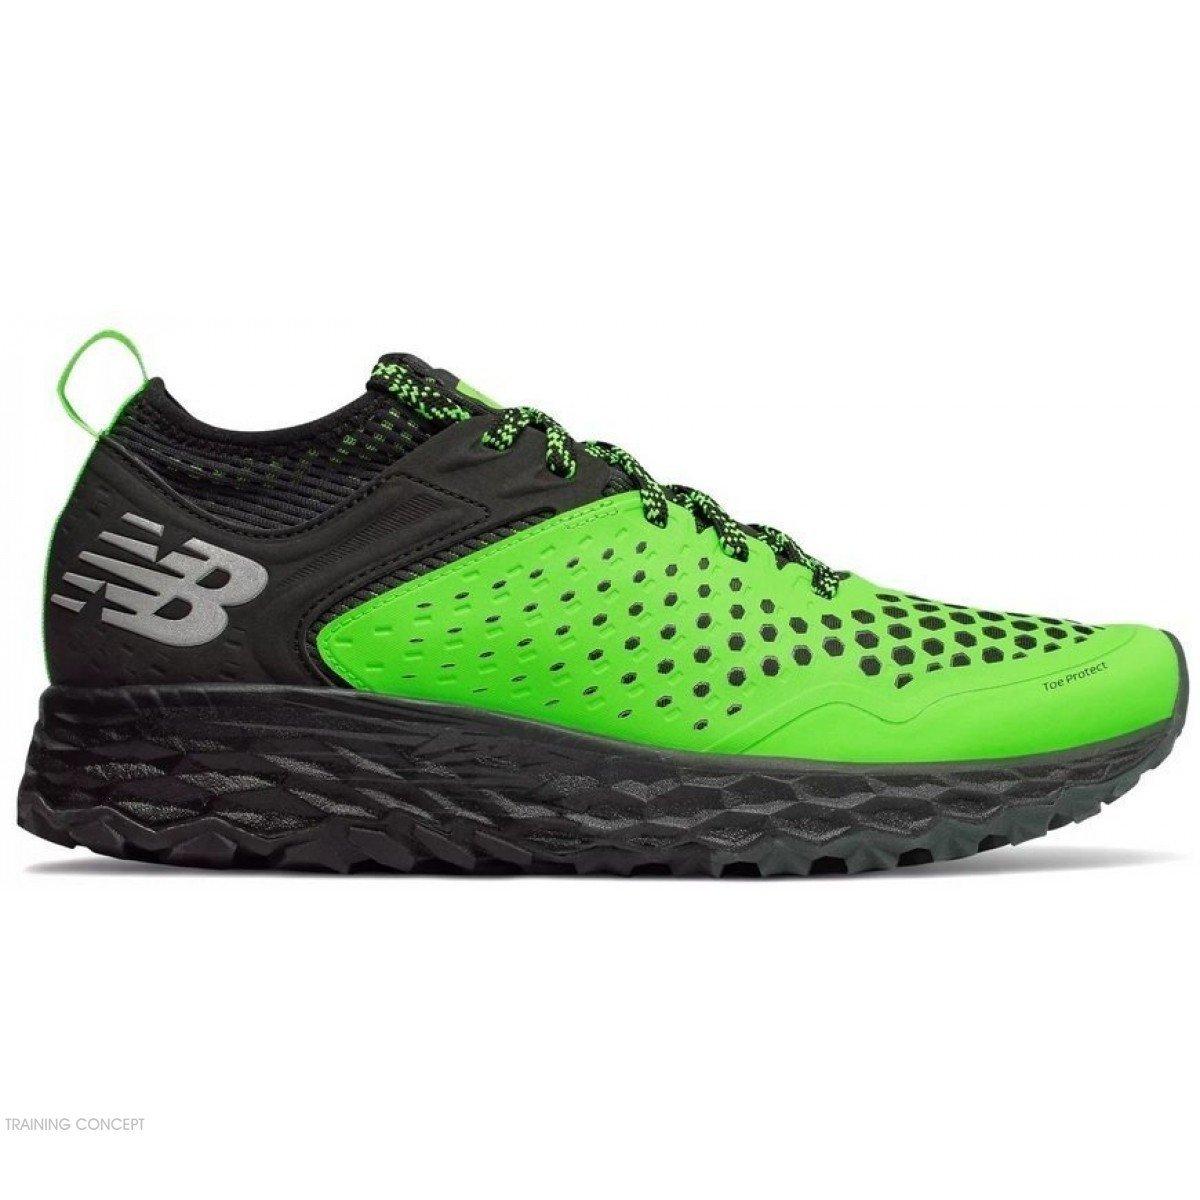 trail new pour hommes de chaussures balance mt running sQhdtrCx